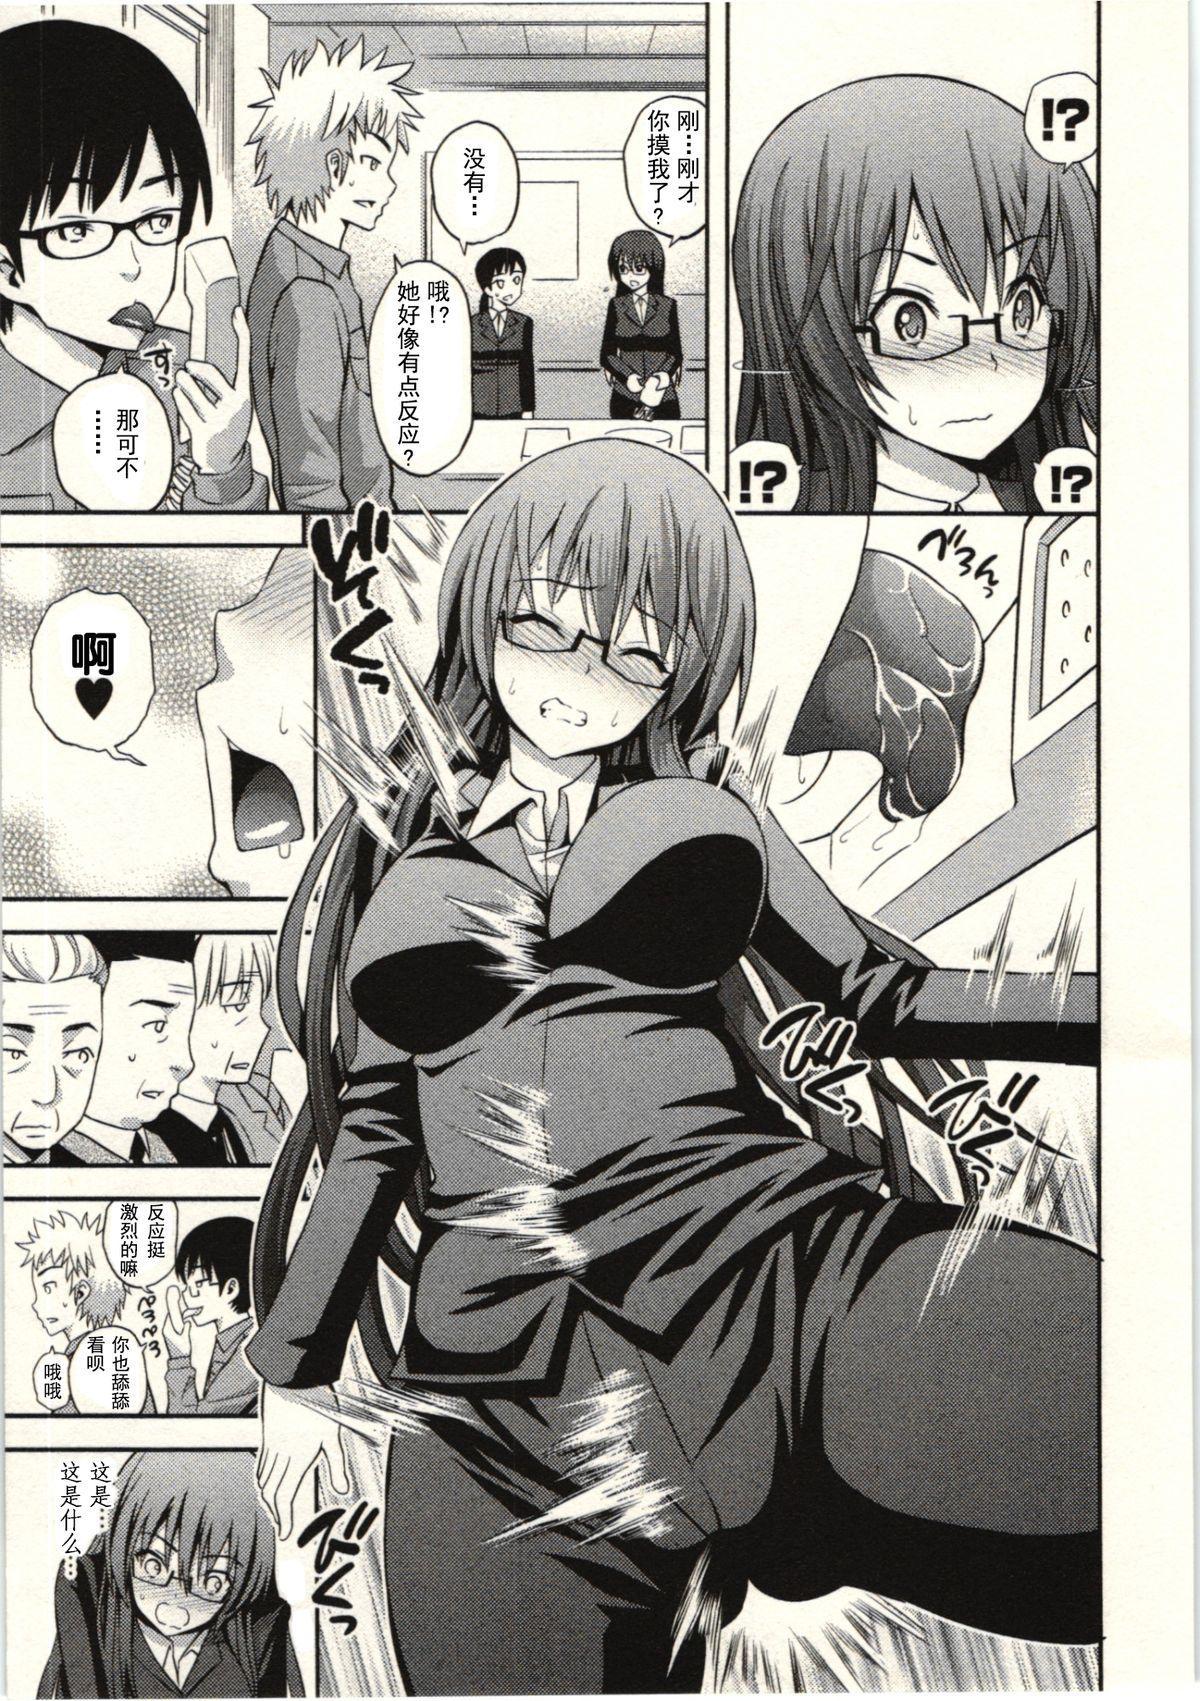 Tadashii Majutsu no Asobikata - The right way of playing of magic. 151